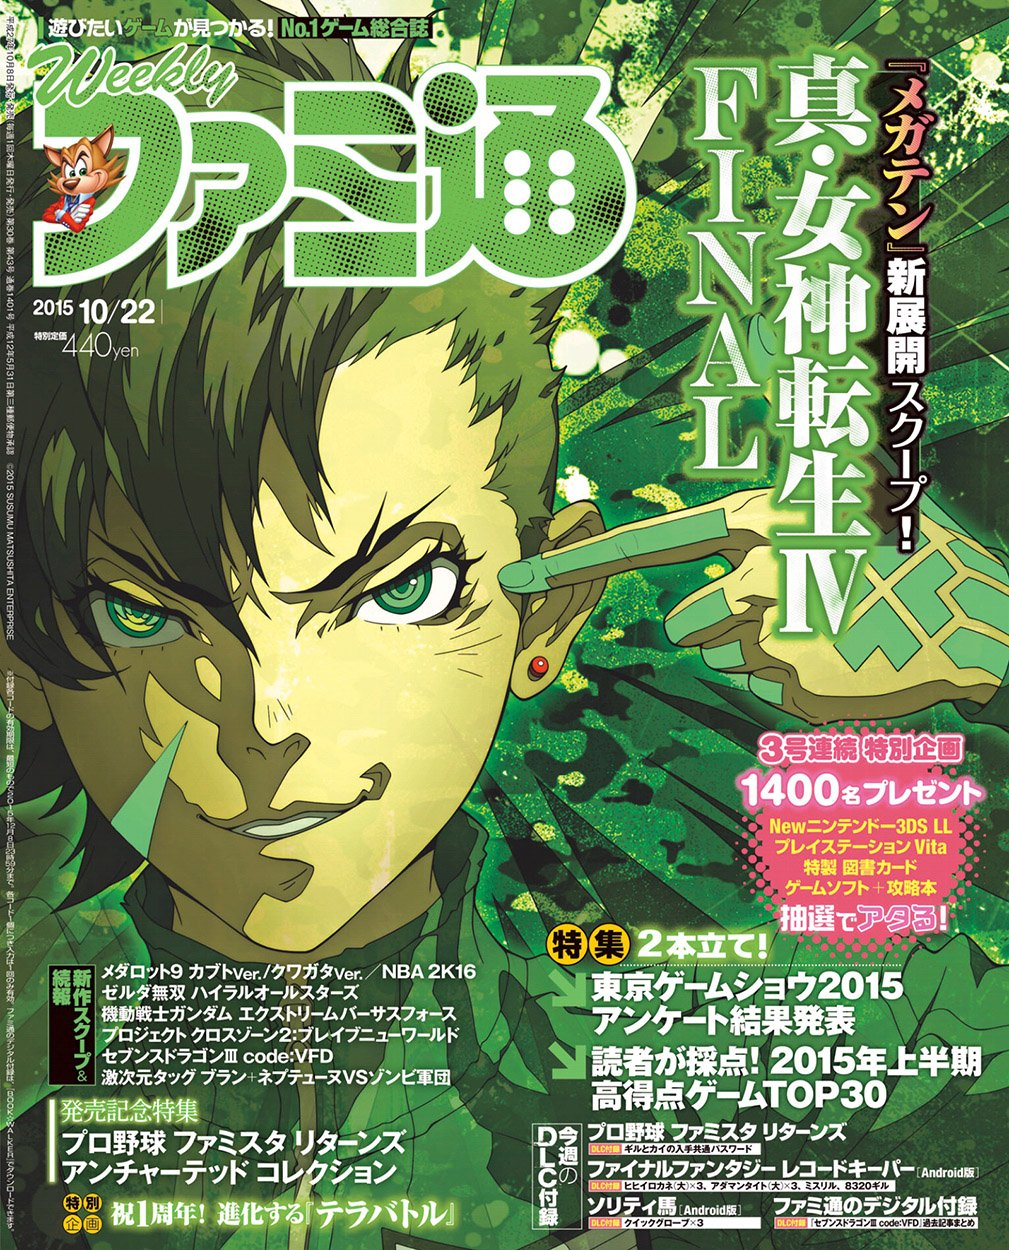 Famitsu 1401 October 22, 2015